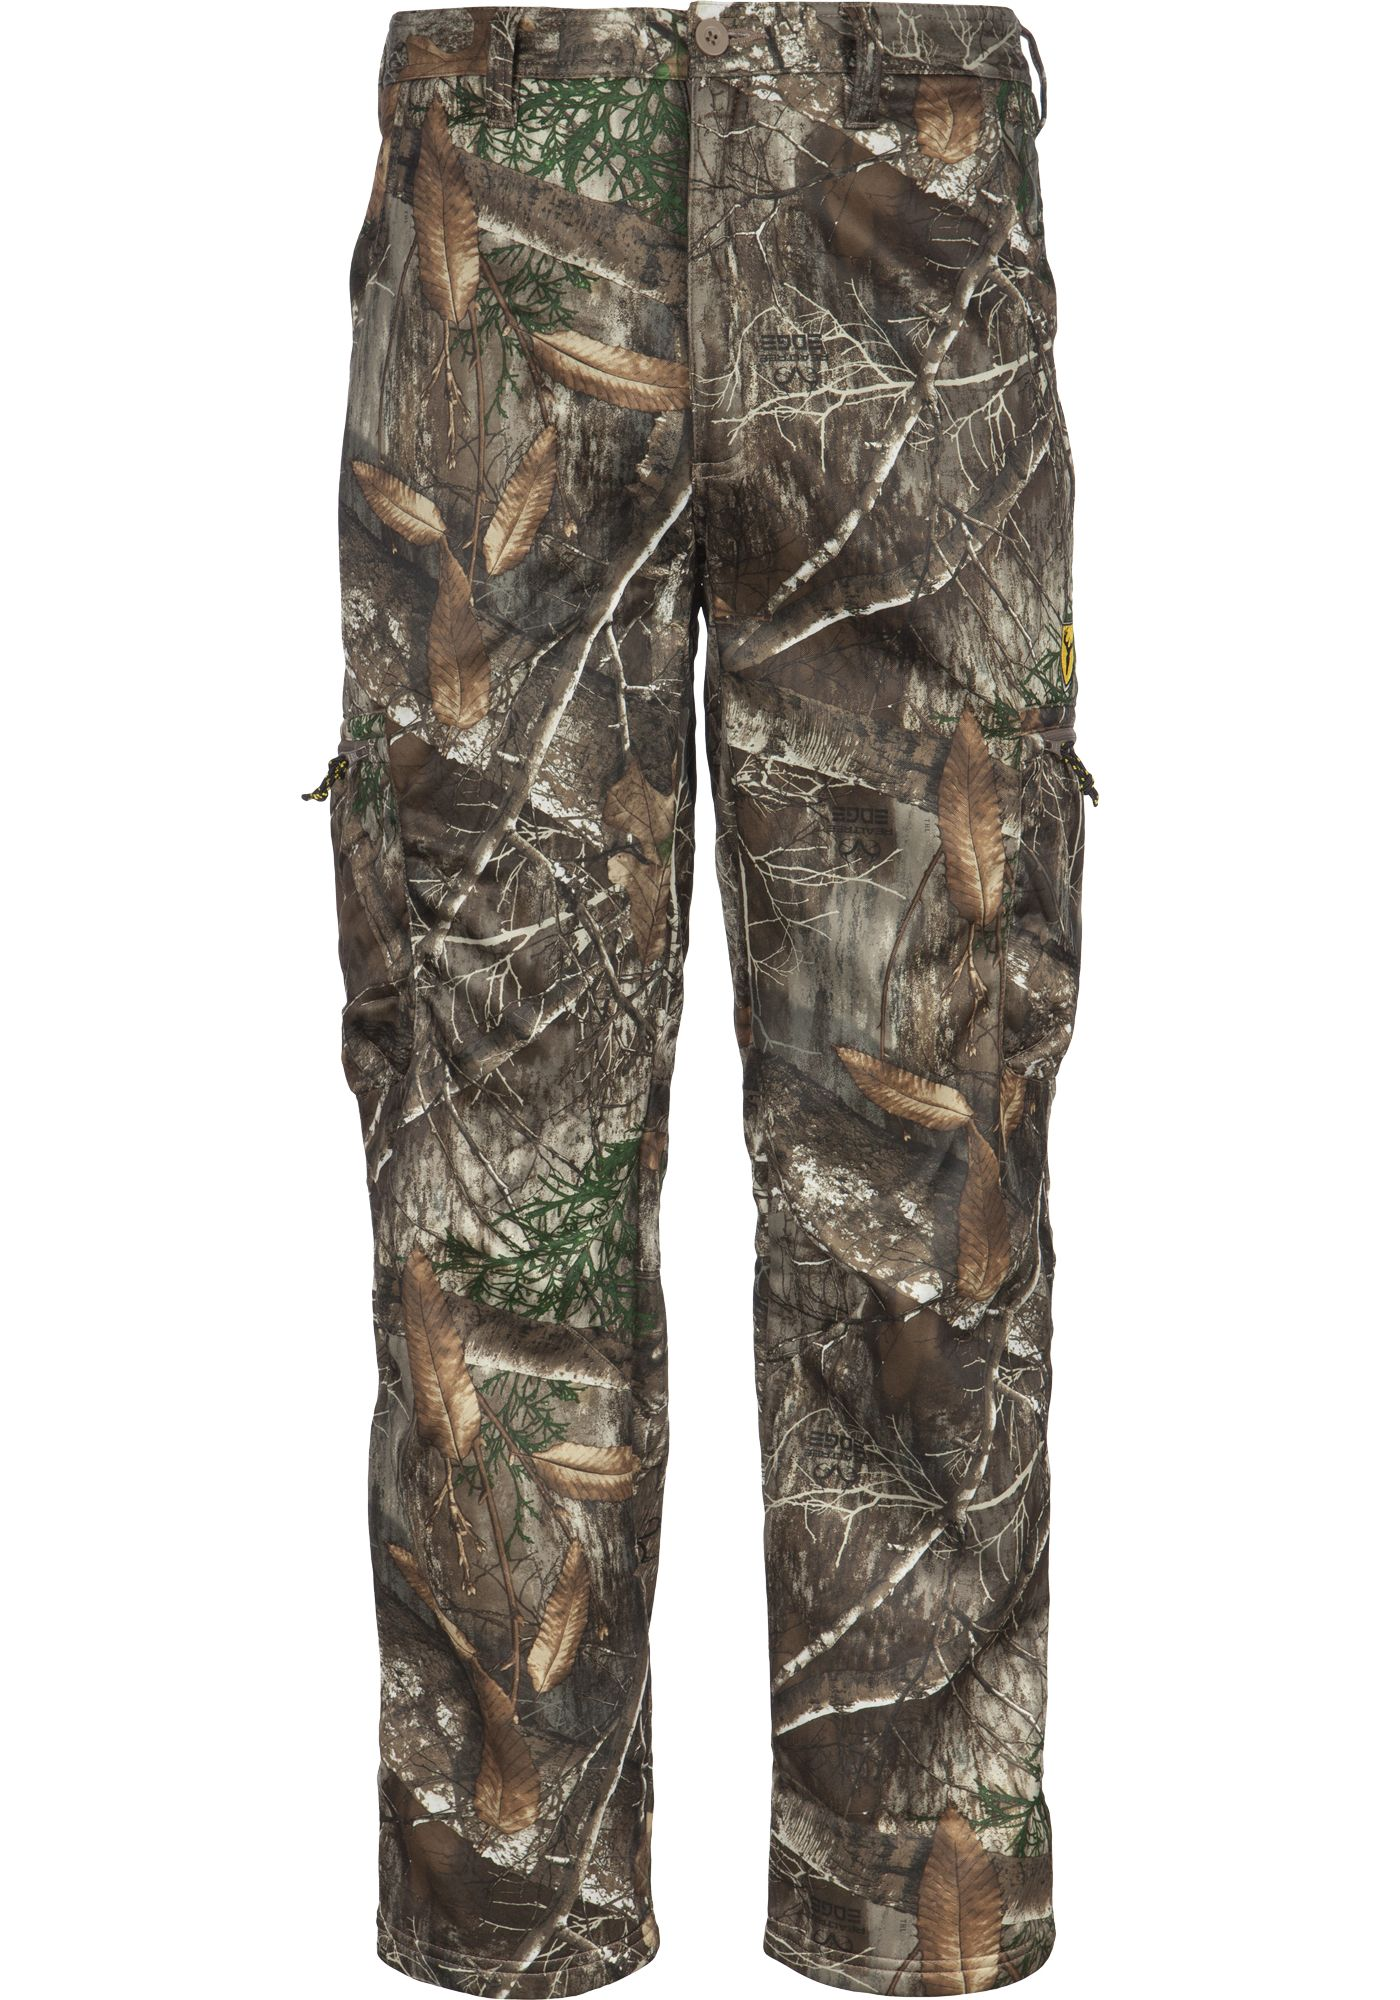 Blocker Outdoors Men's Shield Series Silentec Pants